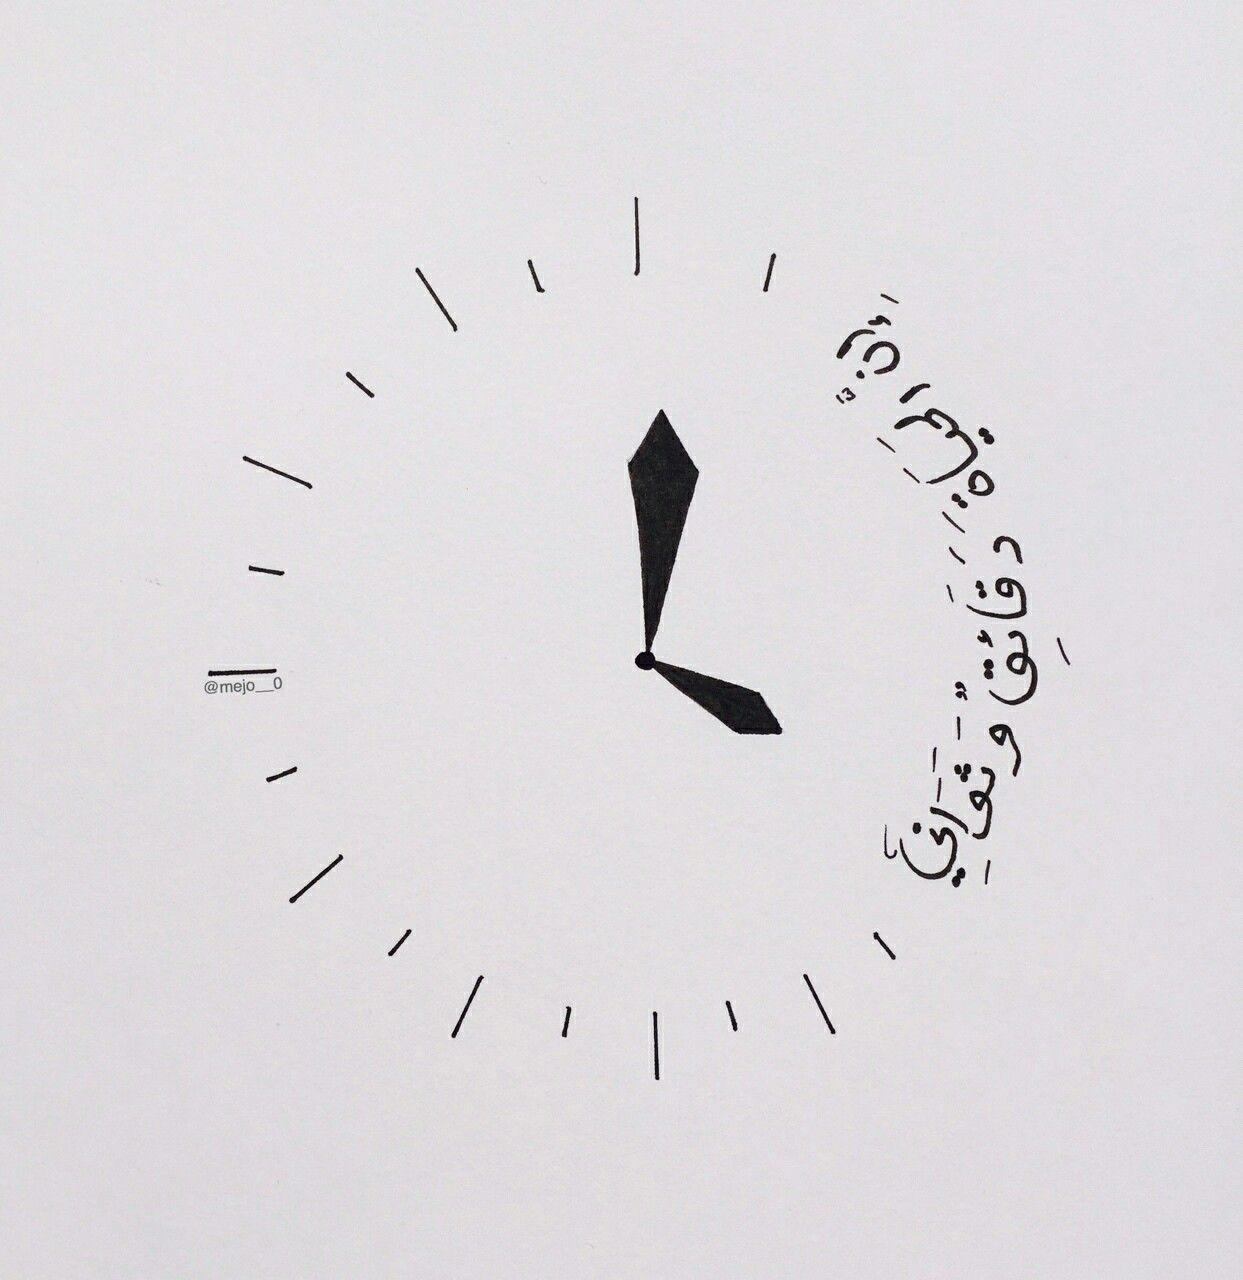 يارب اعني على طاعتك و ذكري Islamic Quotes Wallpaper Arabic Quotes Beautiful Quran Quotes